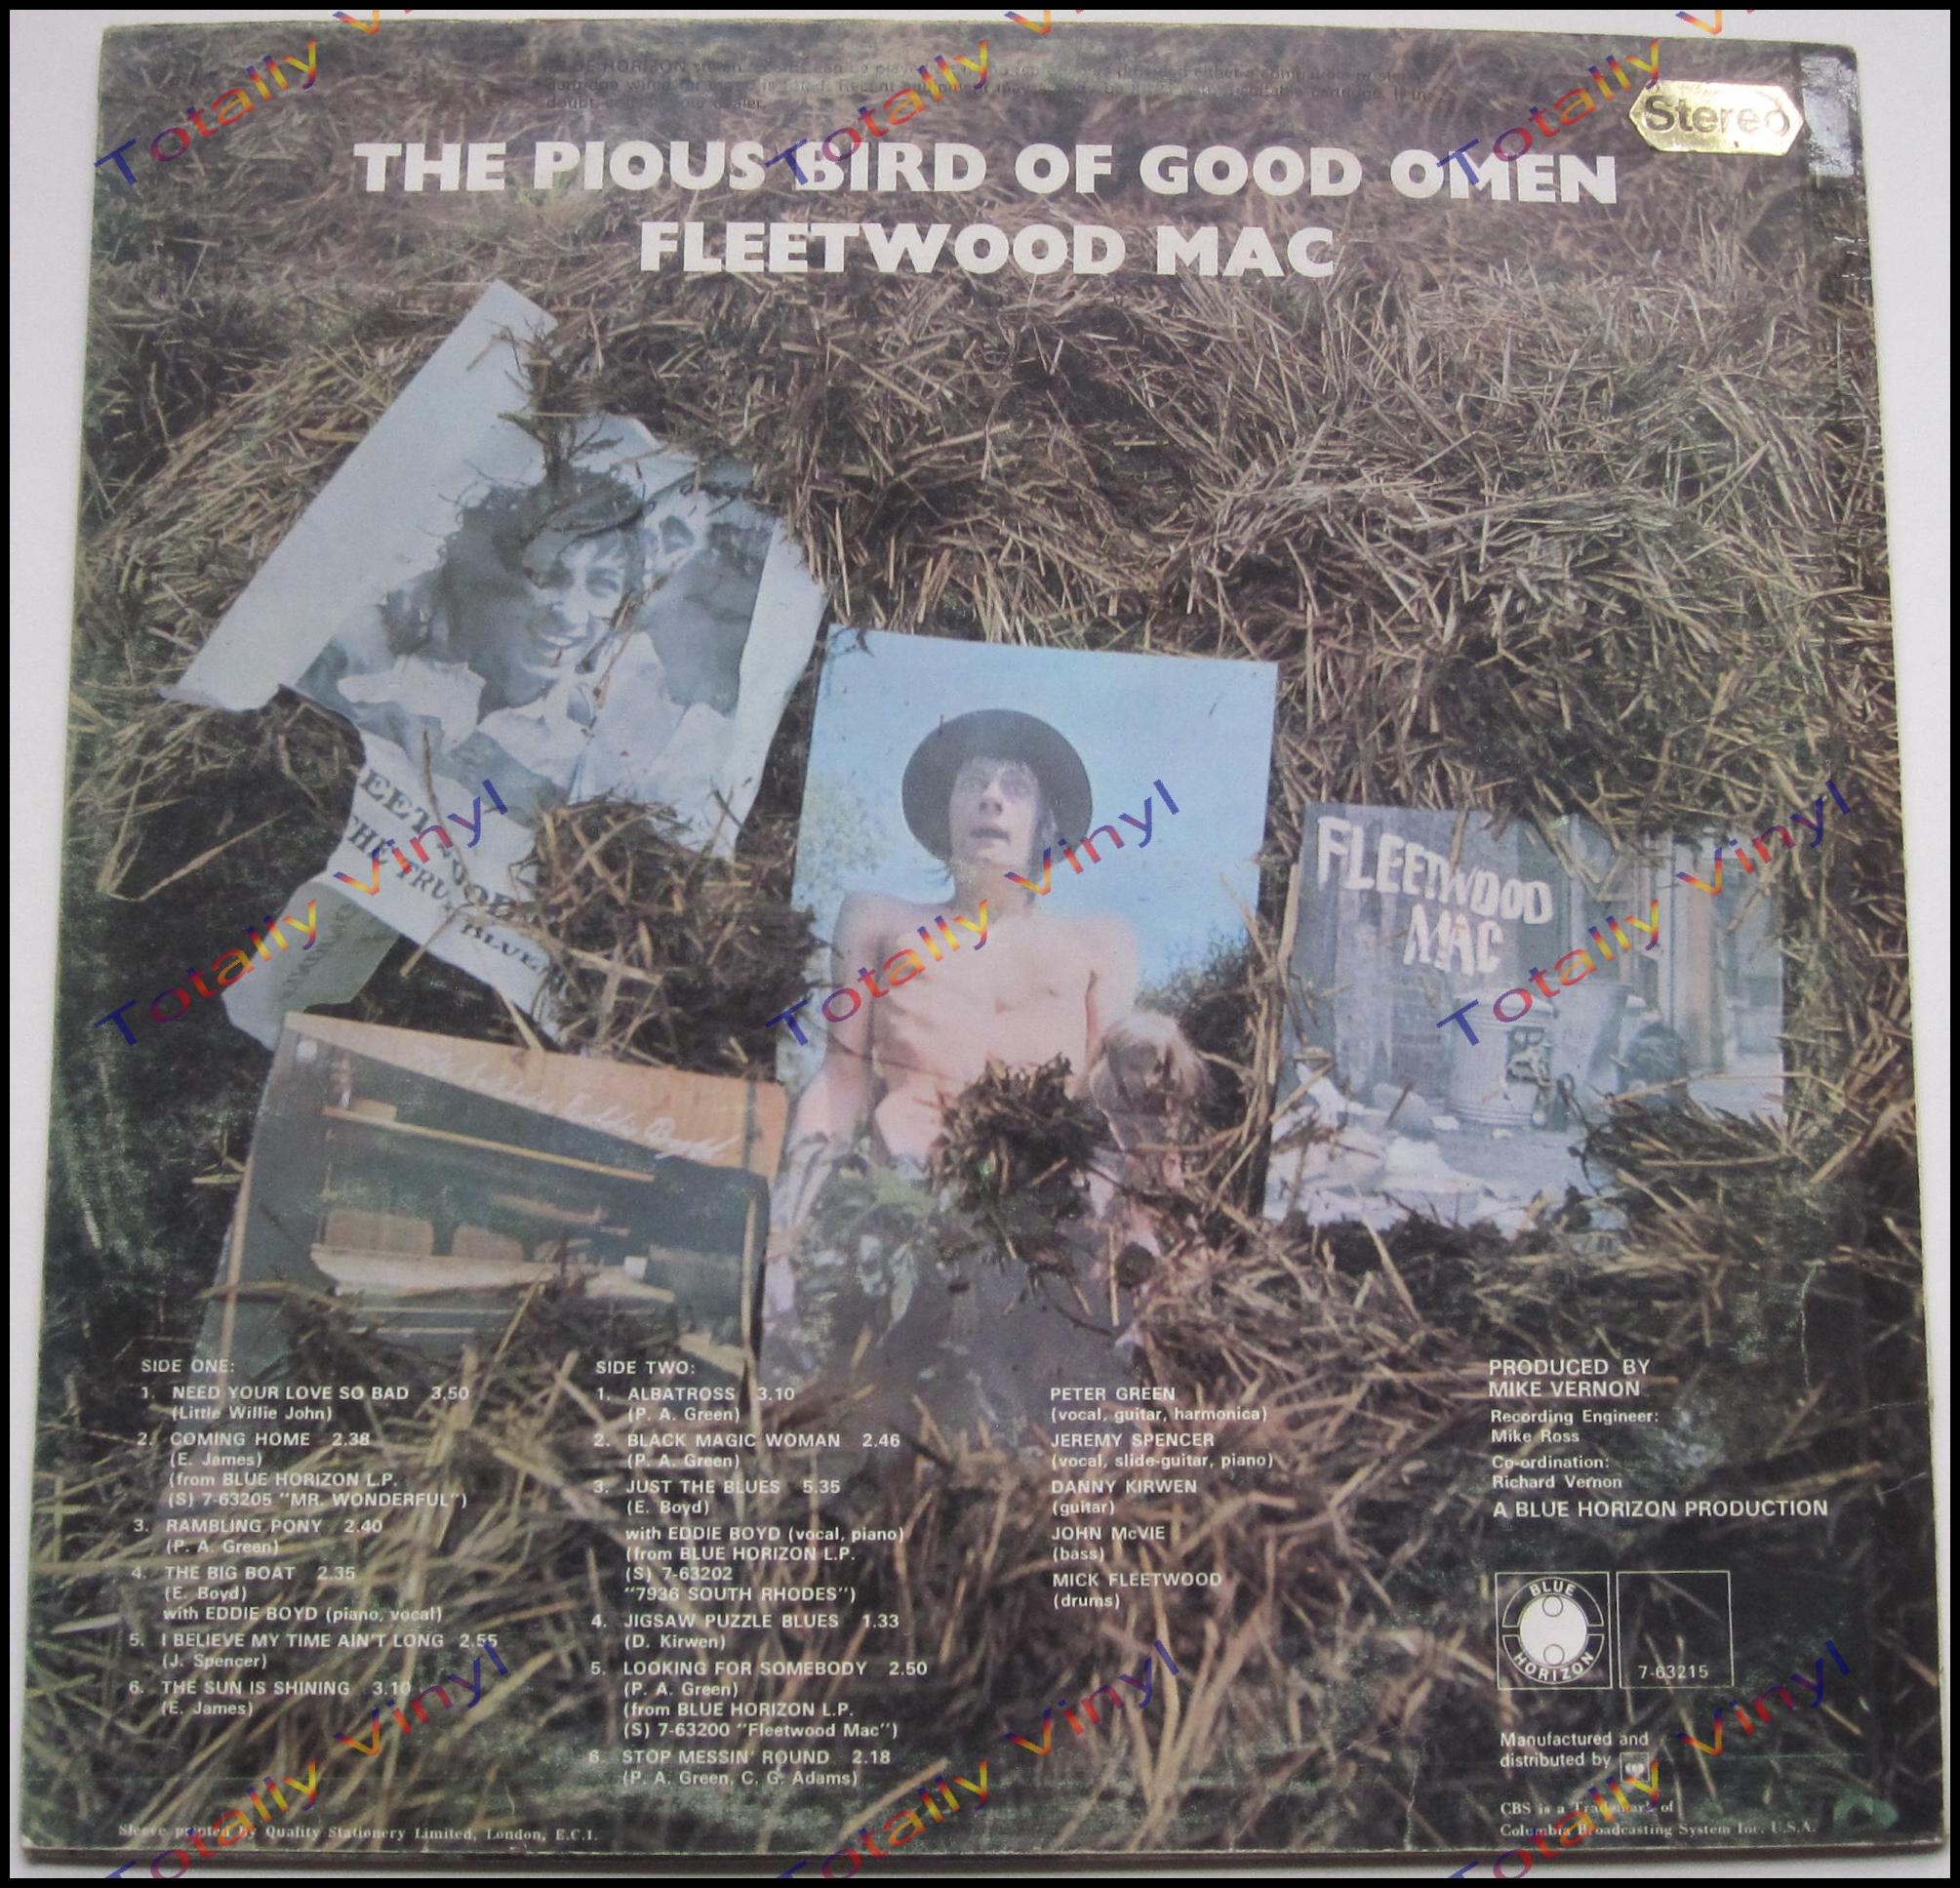 Totally Vinyl Records Fleetwood Mac The Pious Bird Of